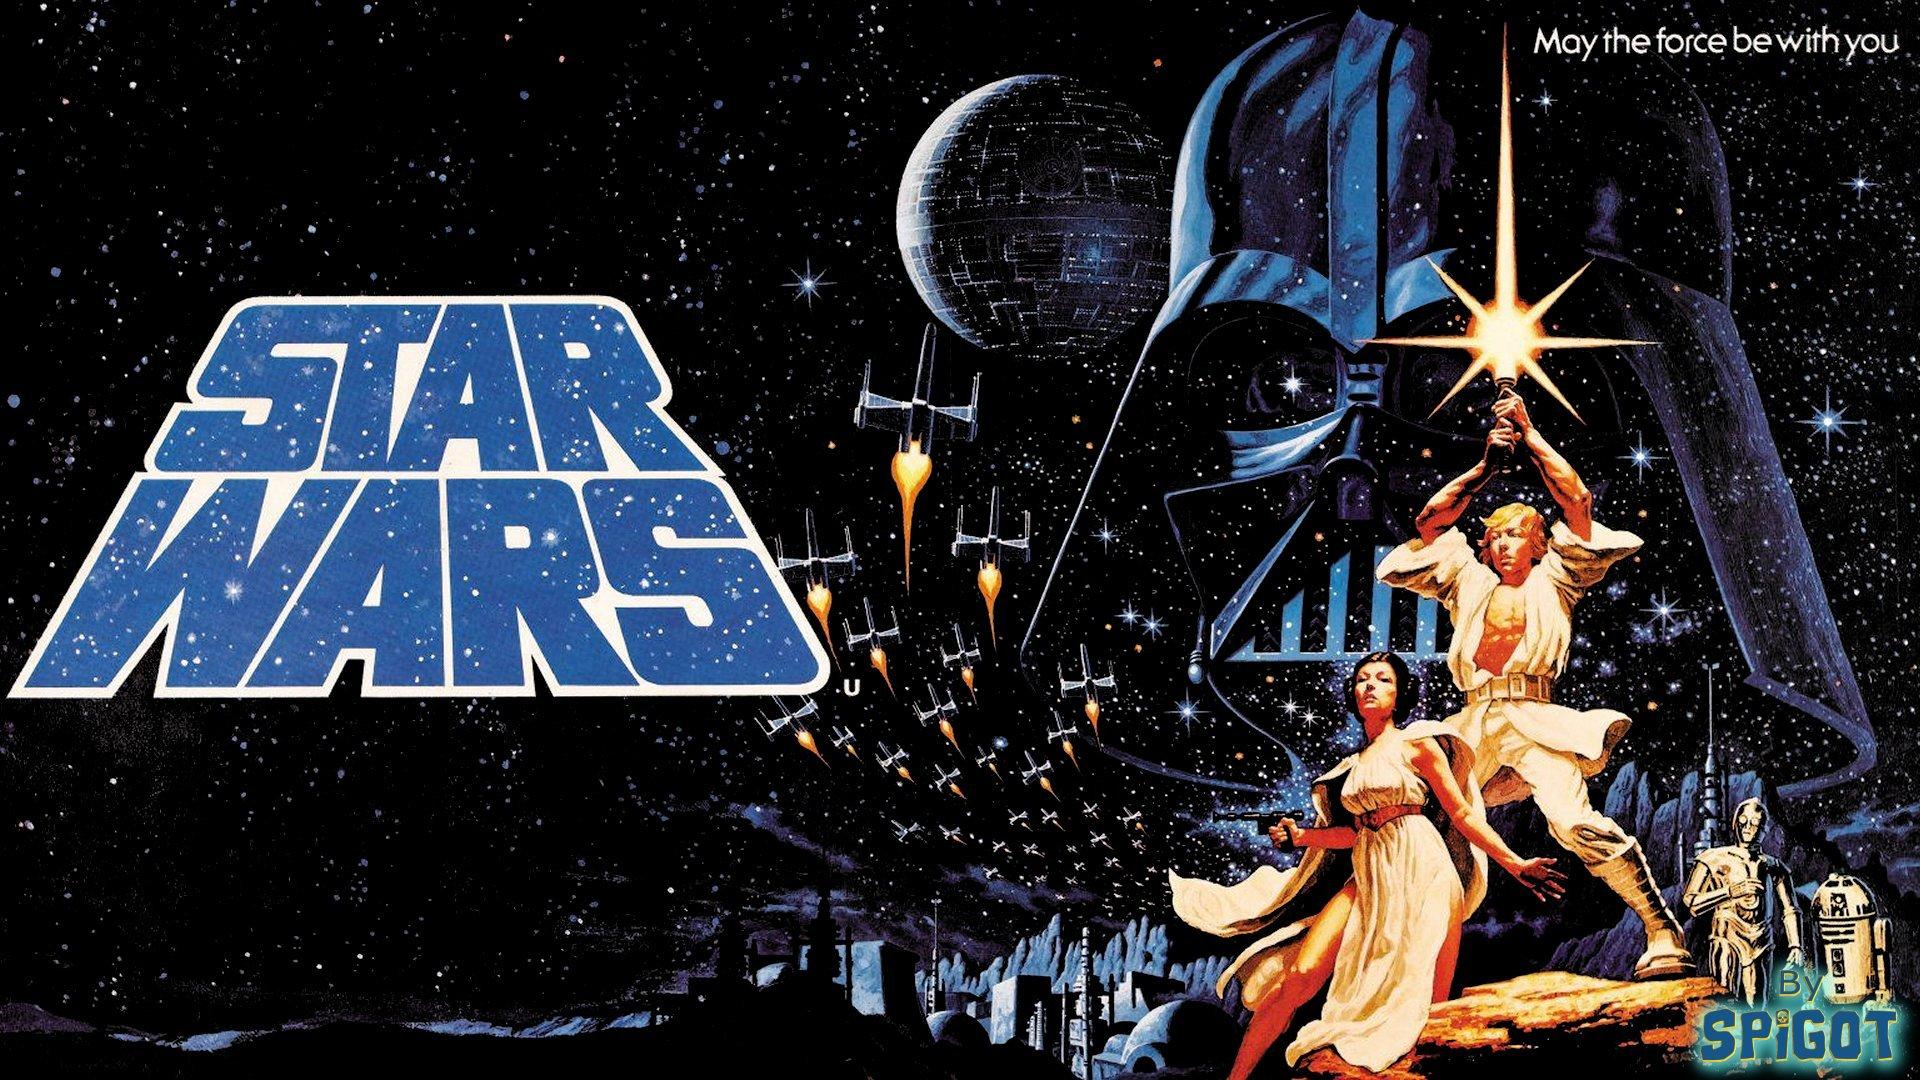 Star Wars Hd Wallpaper   Desktop Backgrounds 1920x1080